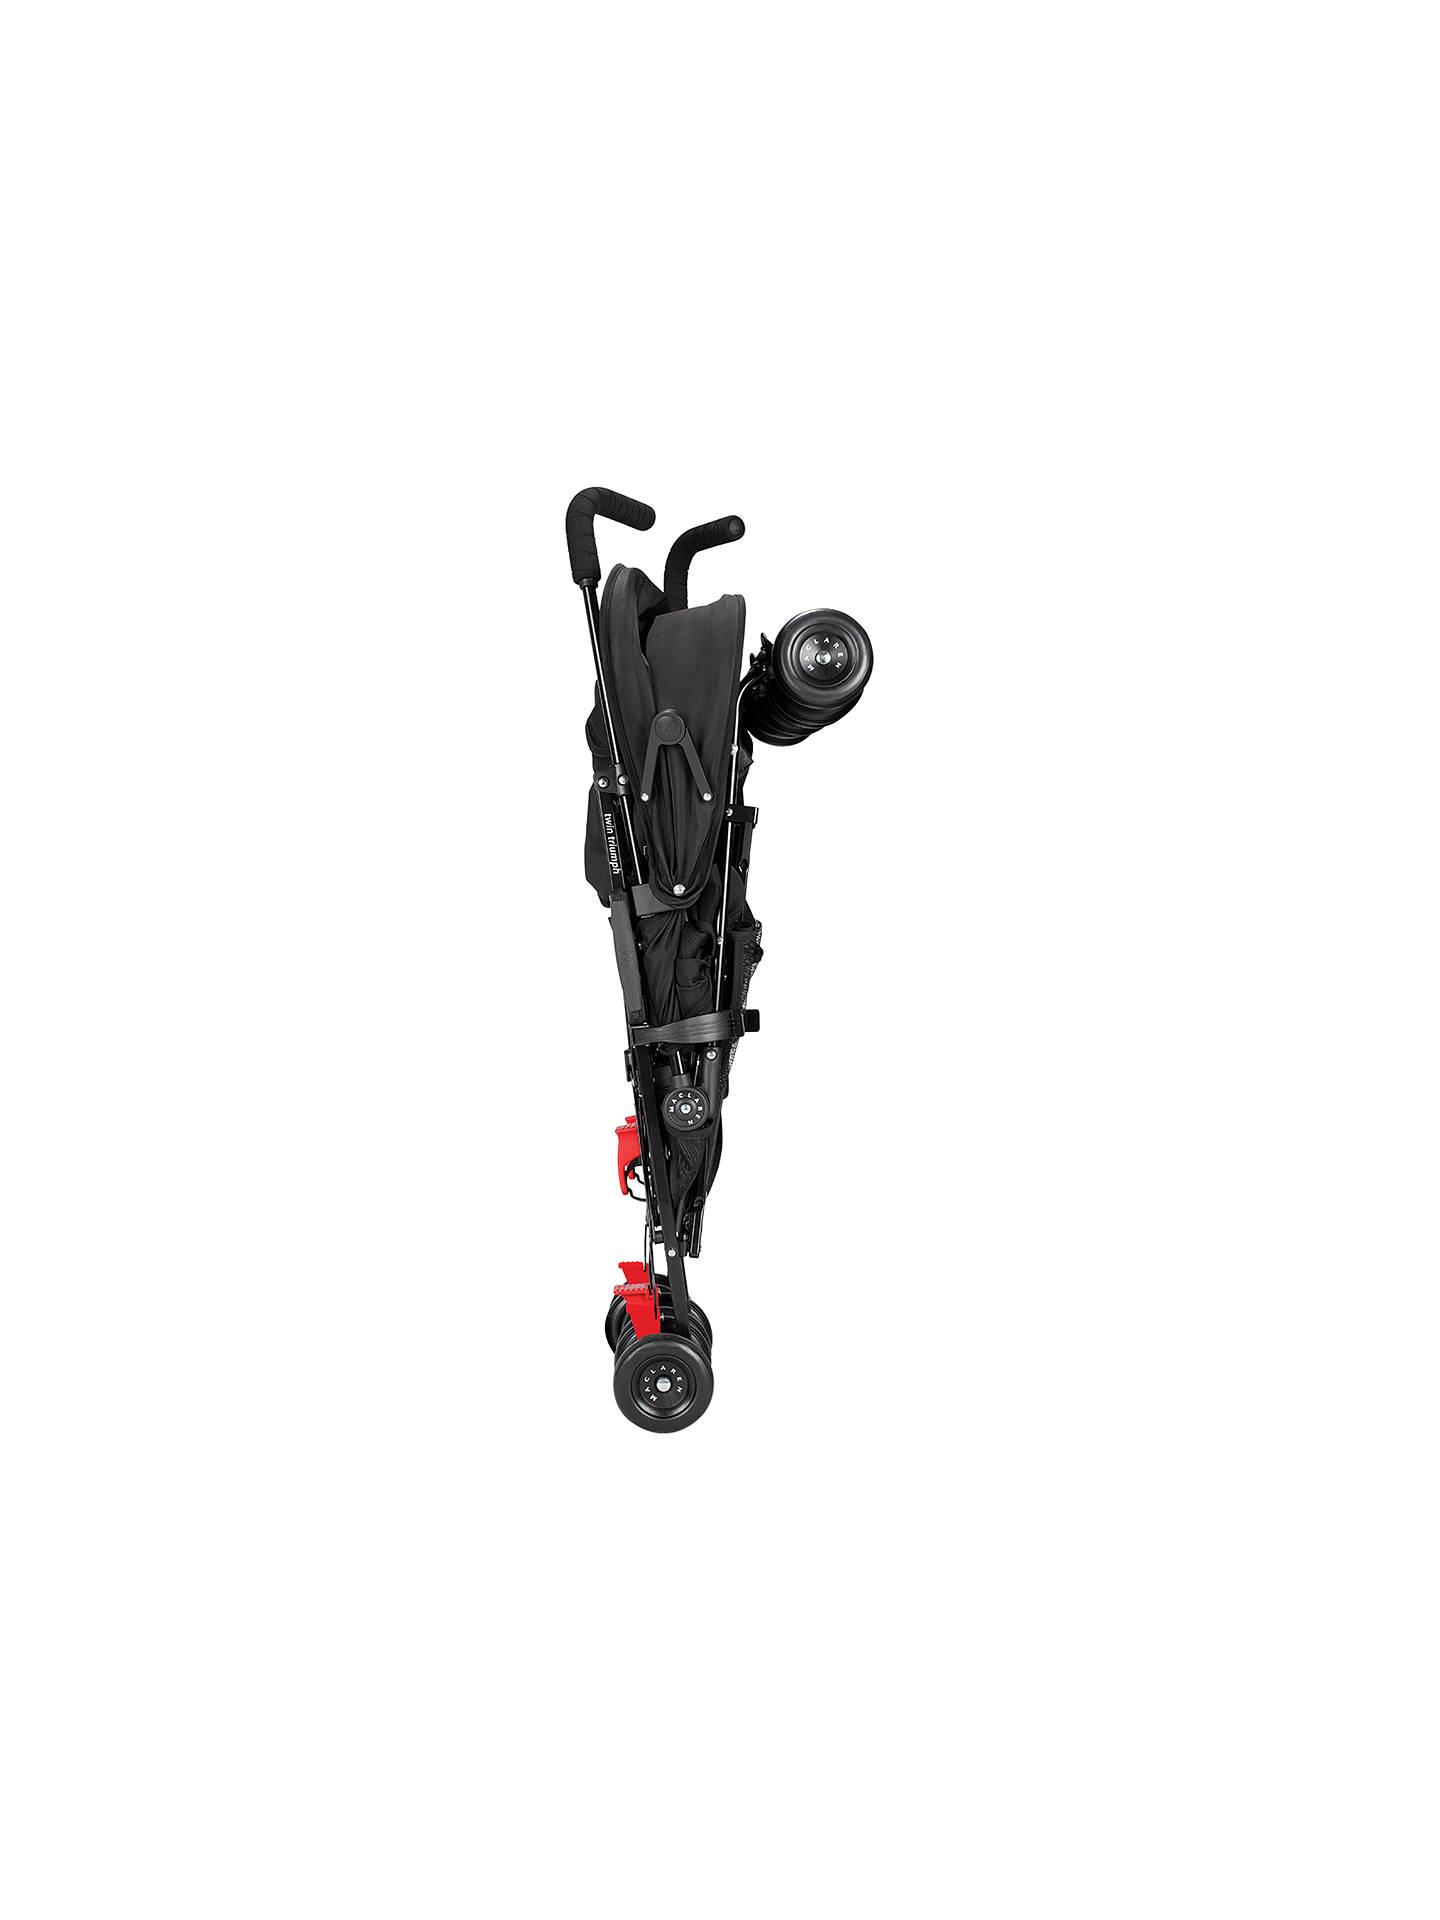 Maclaren Twin Triumph Stroller, Black/Charcoal at John